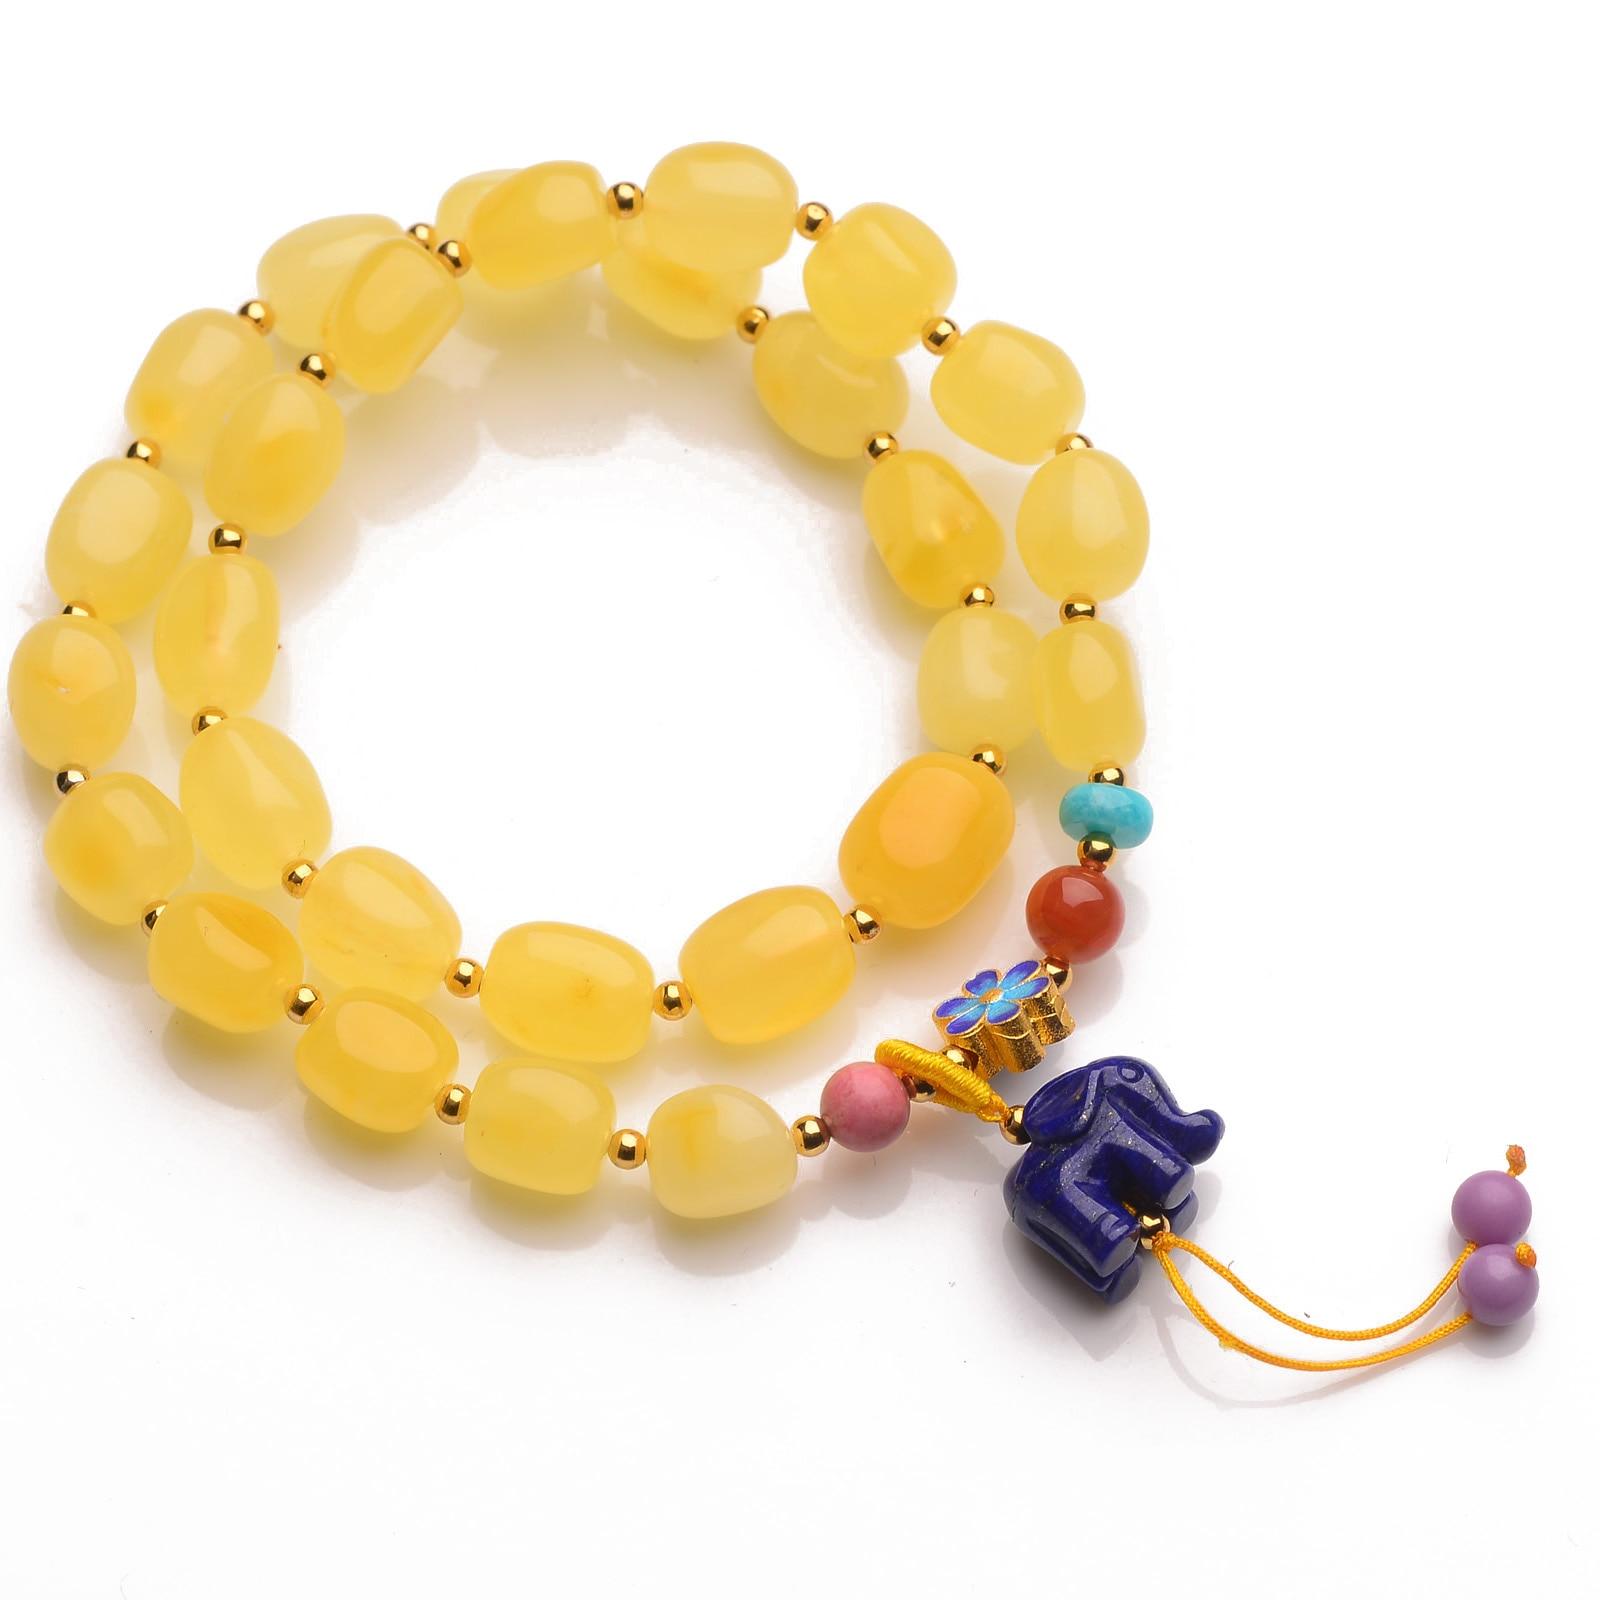 Handmade Authentic Wax Crystal Bracelets handmade authentic wax crystal bracelets